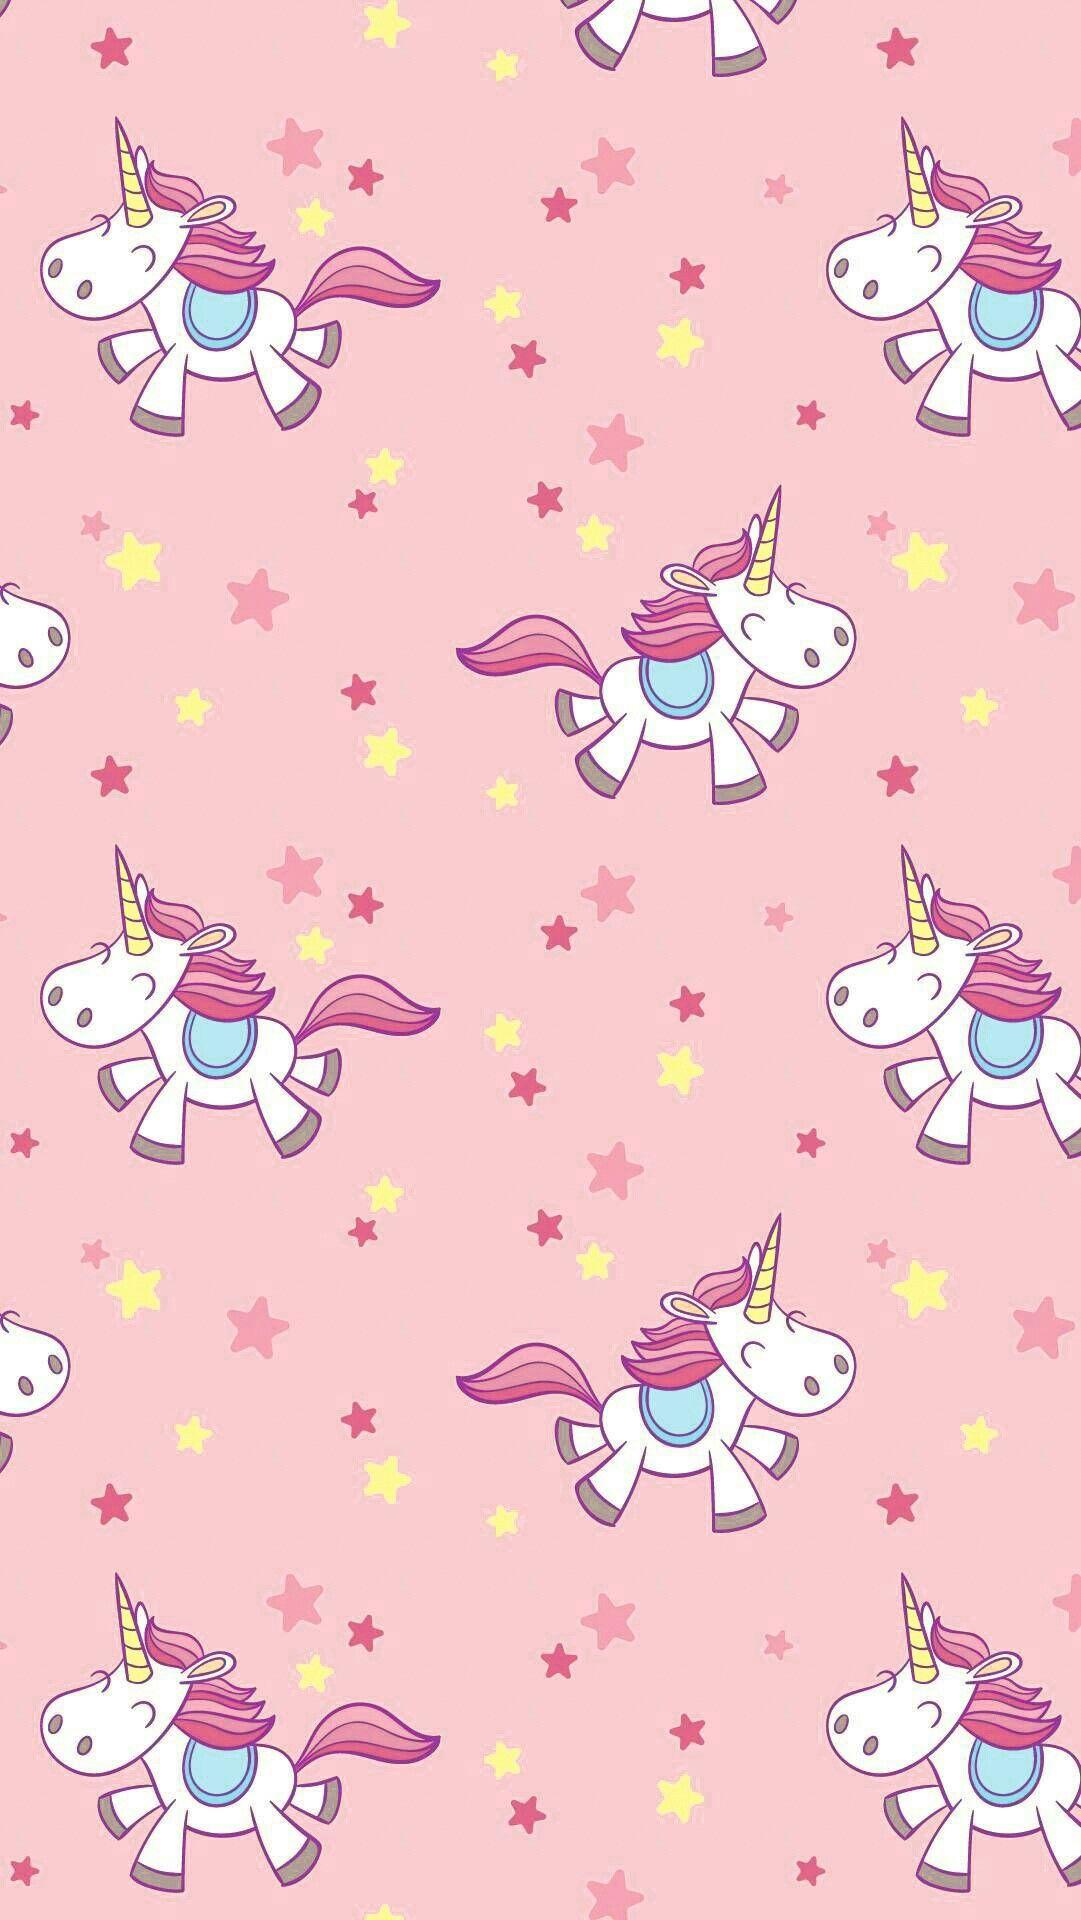 Unduh 300+ Wallpaper Iphone Unicorn Tumblr HD Terbaik